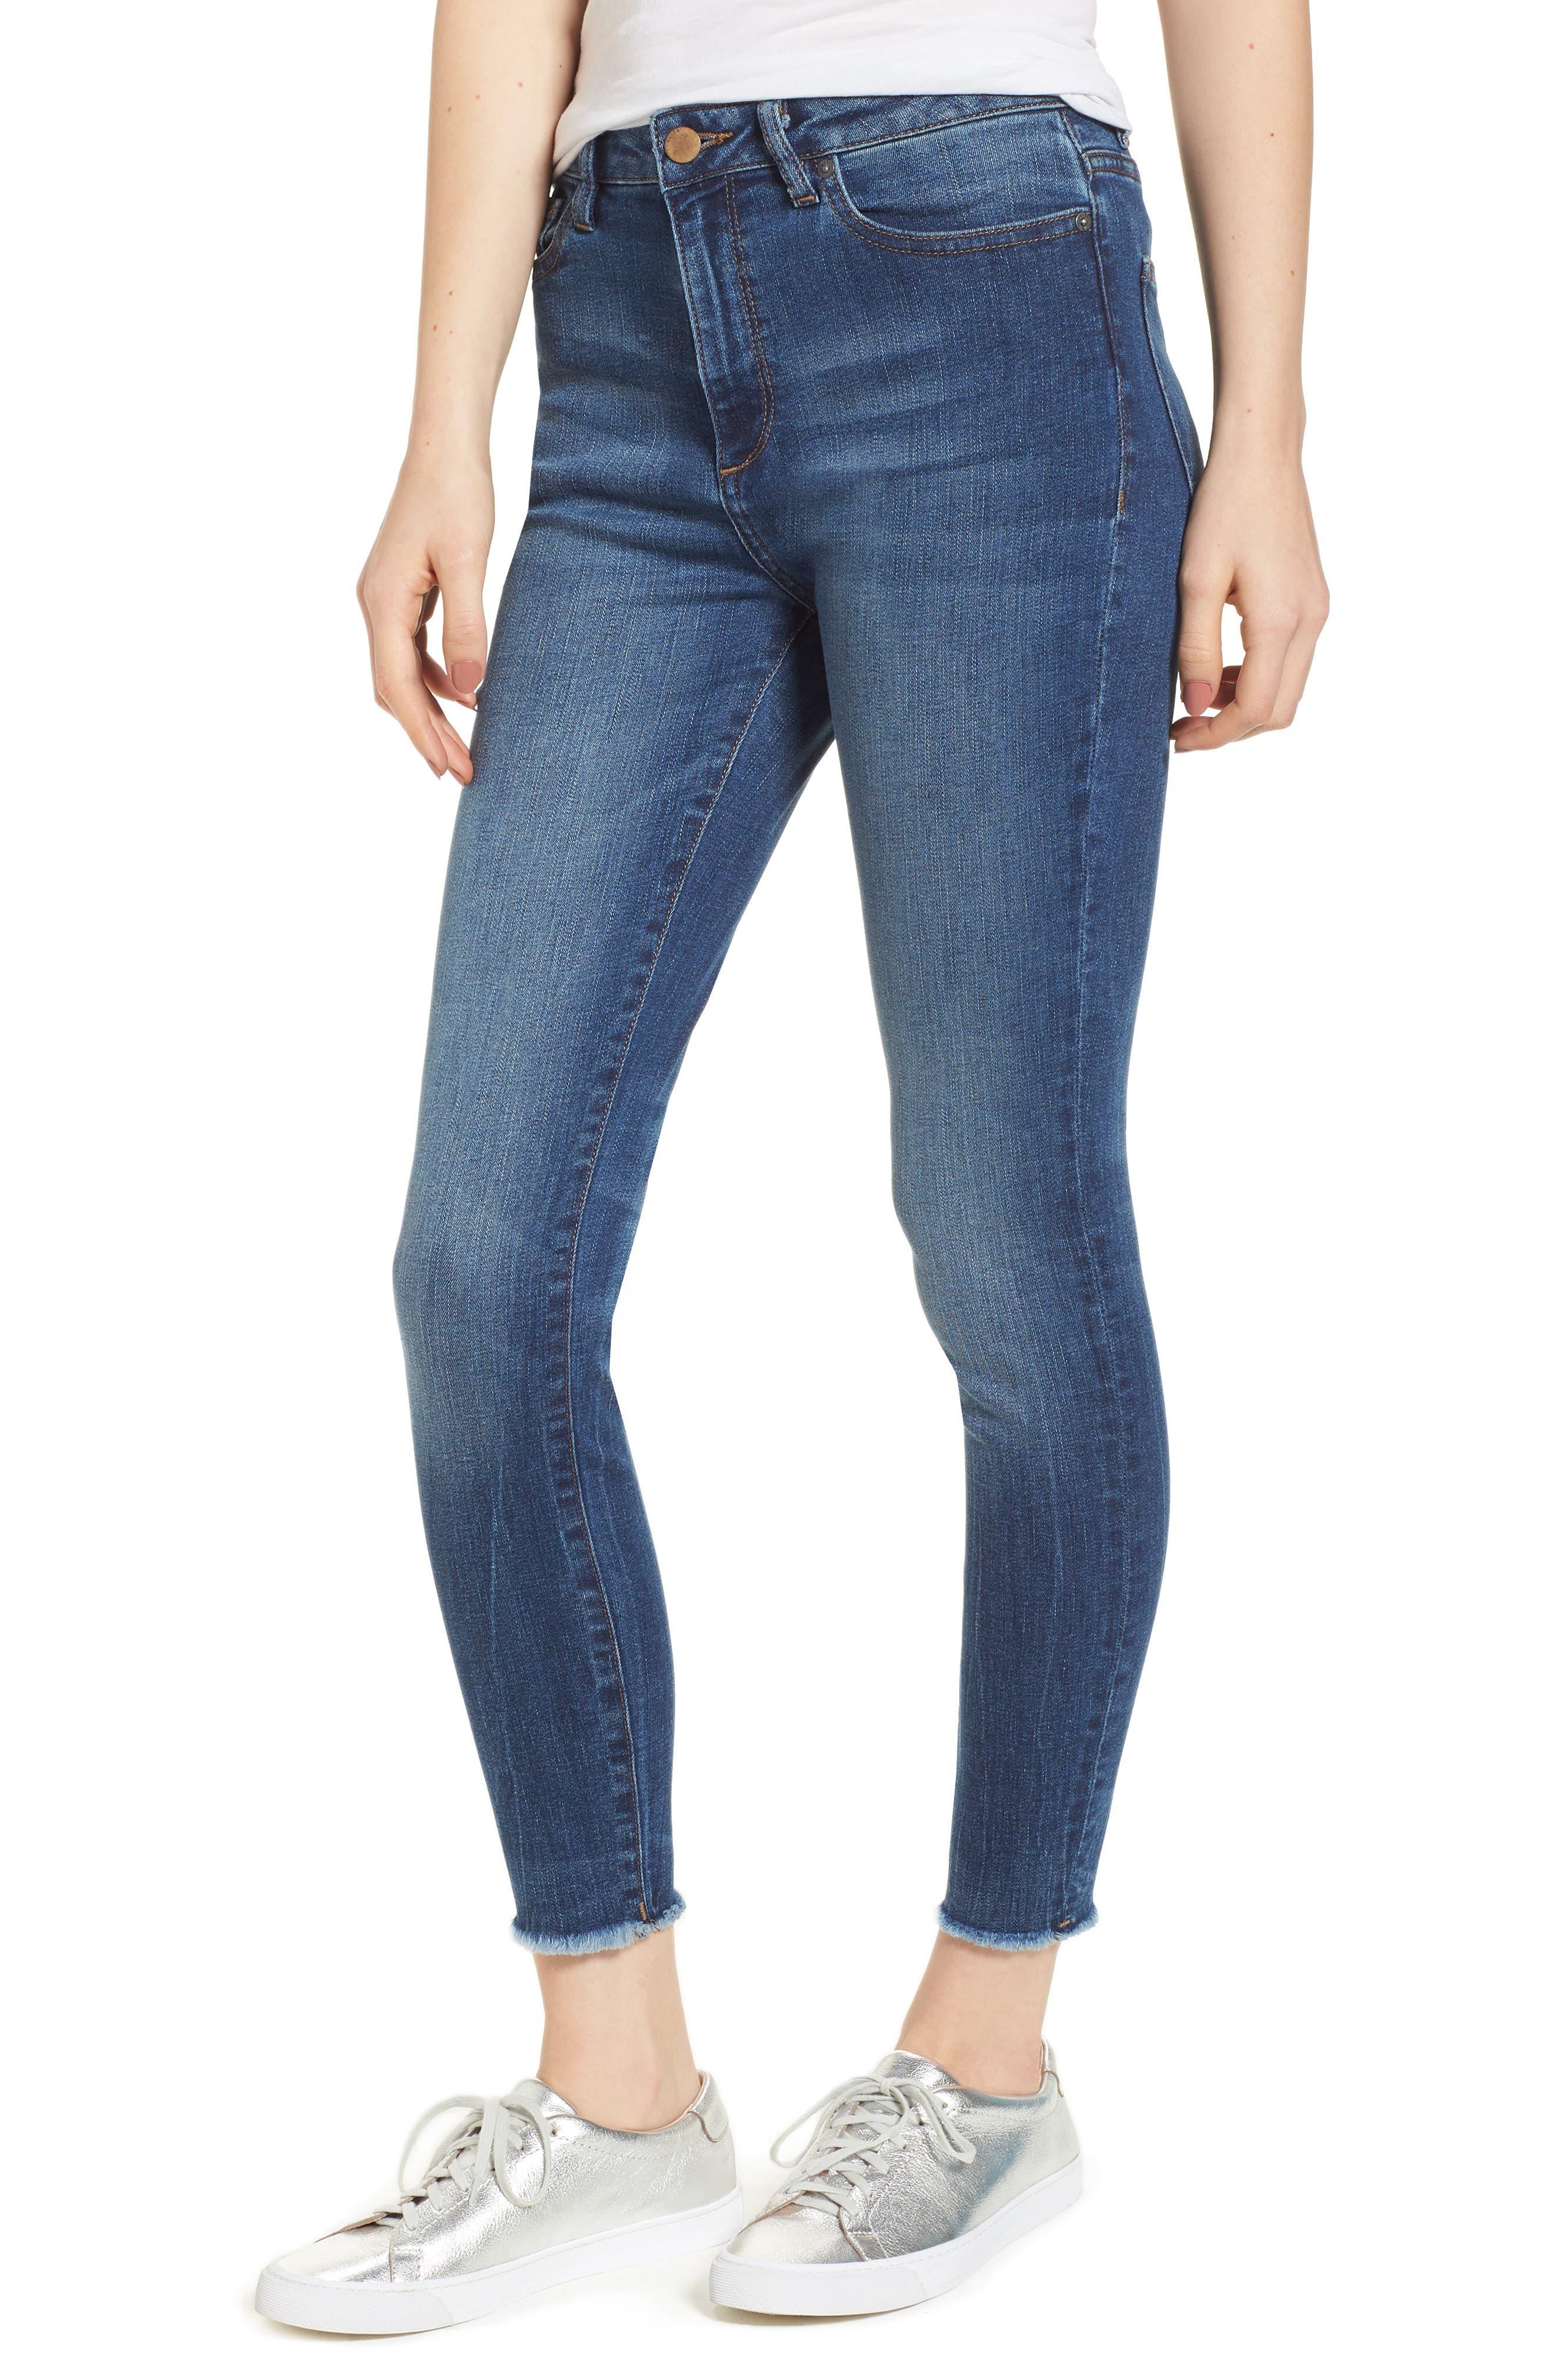 Chrissy Trimtone High Waist Skinny Jeans,                         Main,                         color, 425